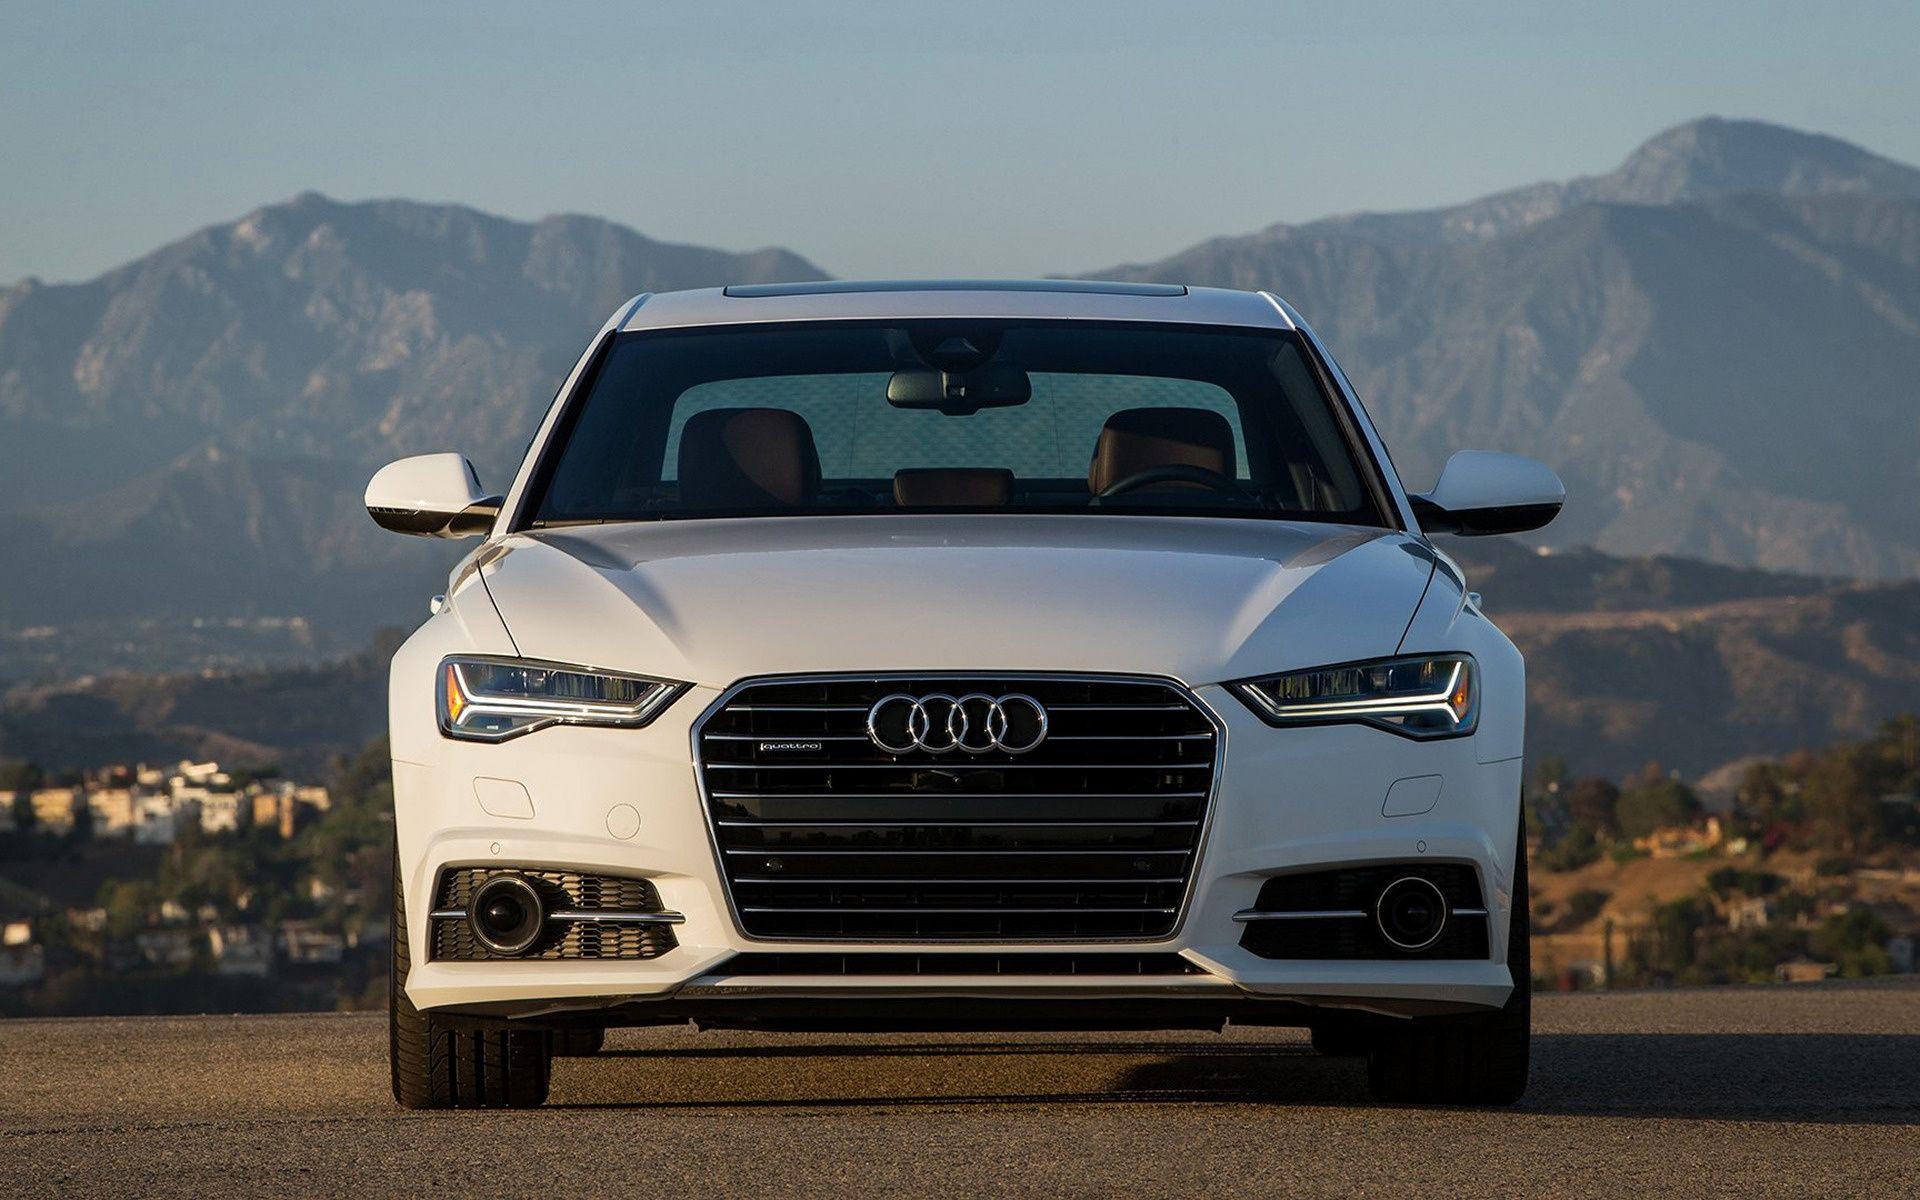 audi a6 sedan wallpapers Audi A6 Sedan S Line 2016 Us Wallpapers